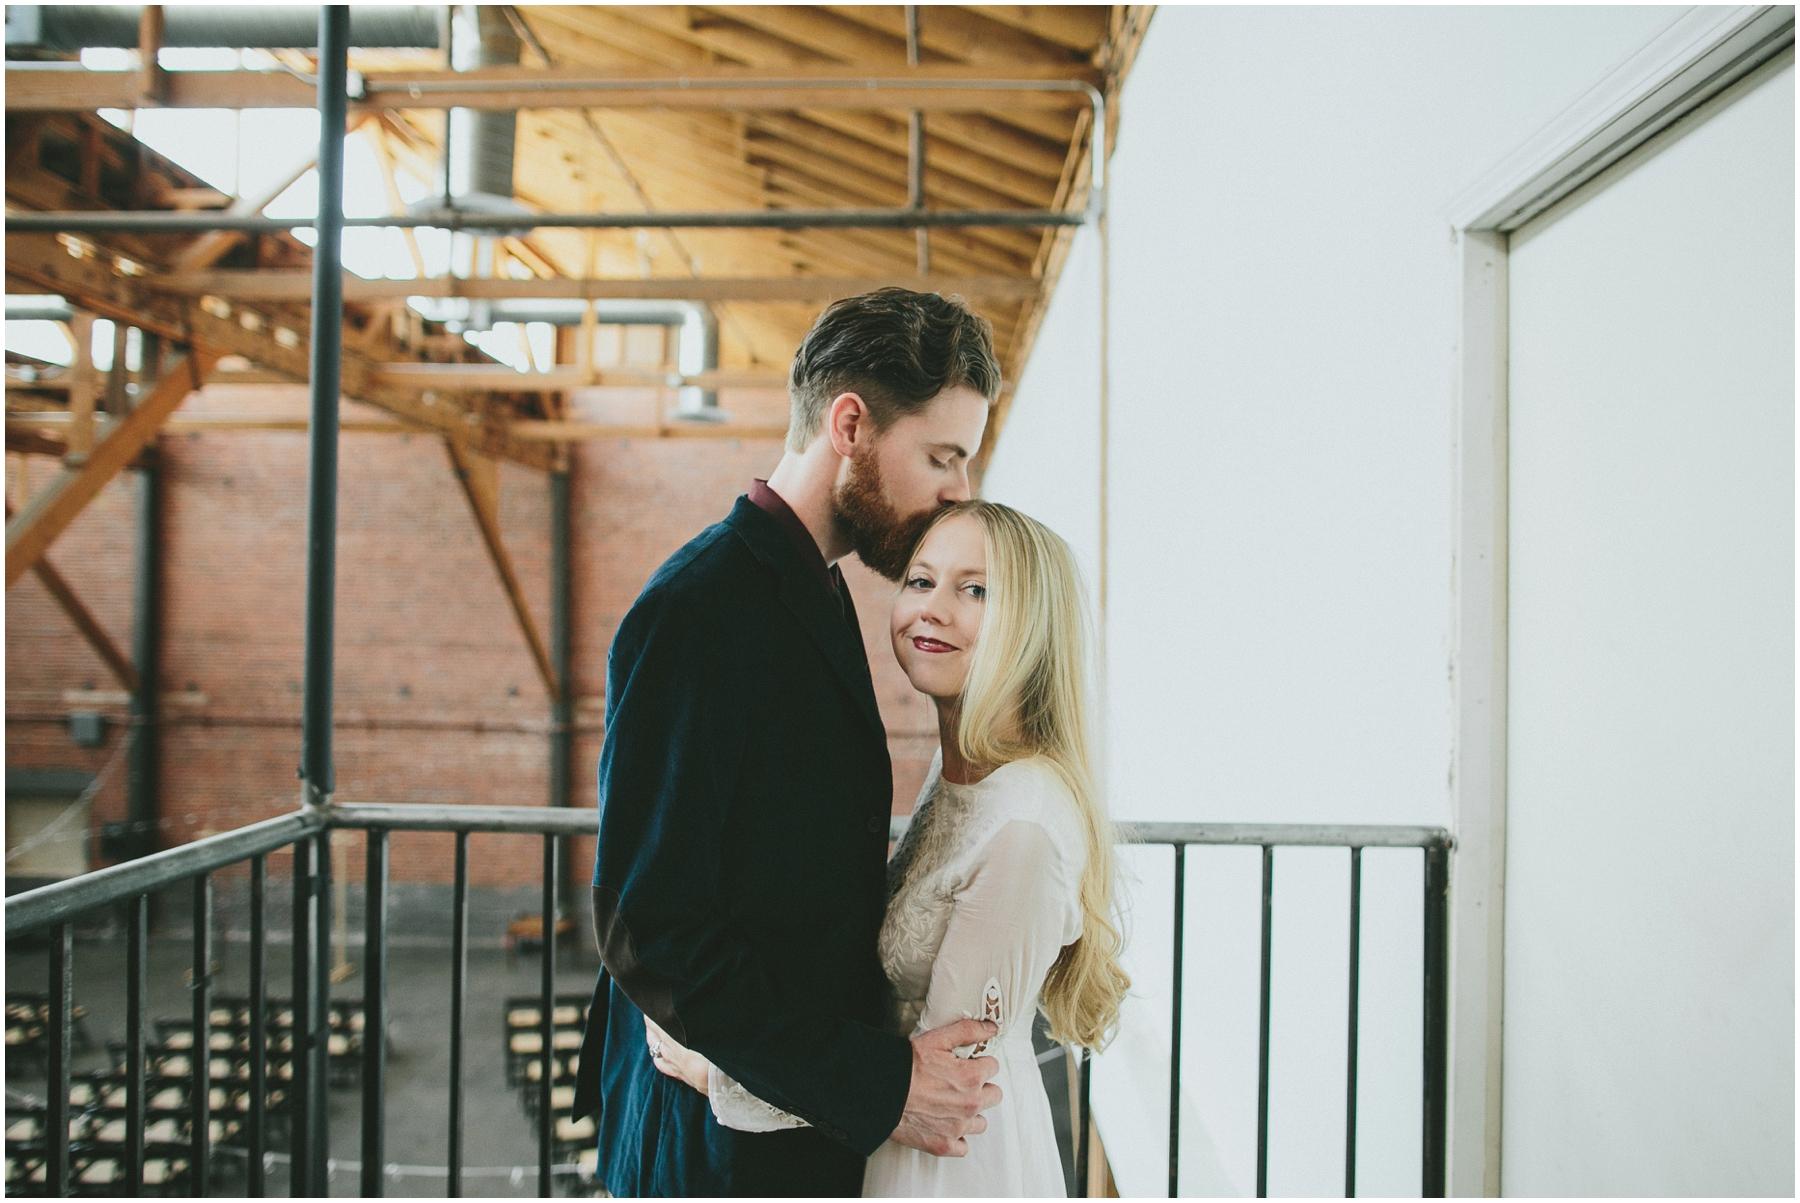 Natalie+Corey-WEDDING_KELLYBOITANO_0024